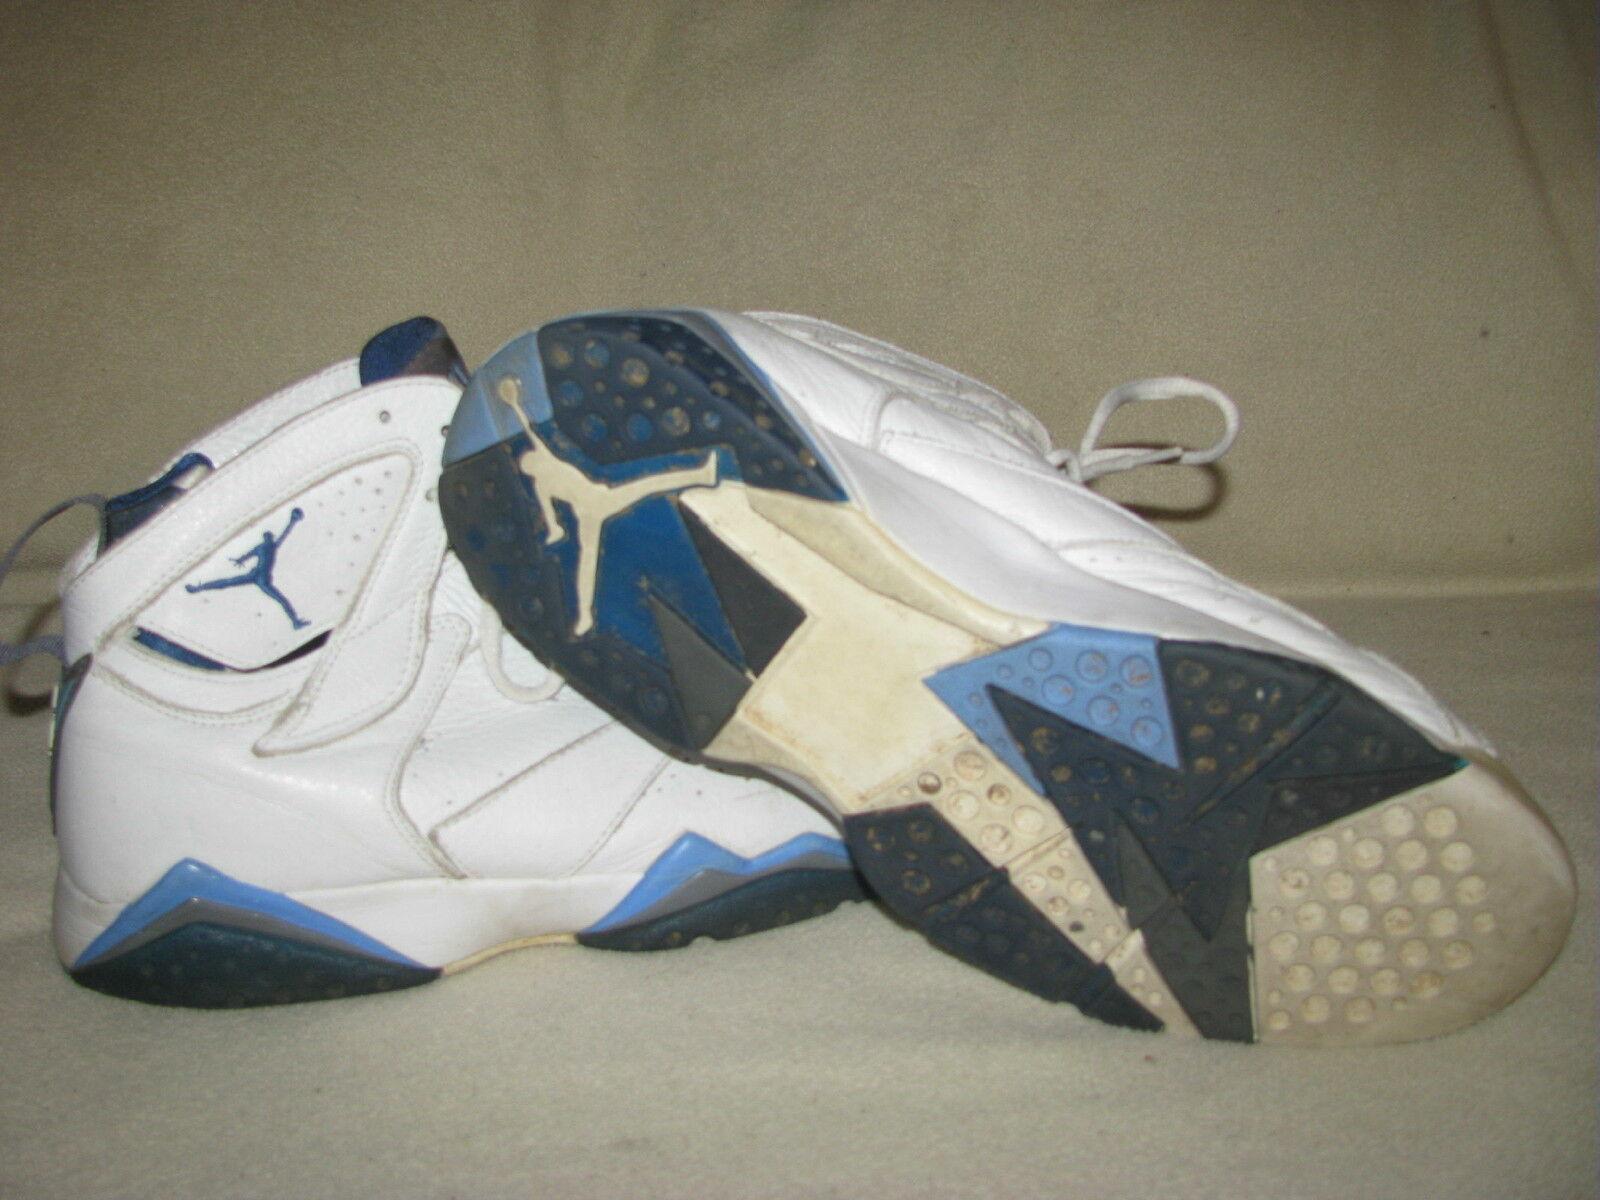 Nike 2002 airjordan vii 7 retro bianco / blu / grigio scarpe francese 304775-141 sz 12